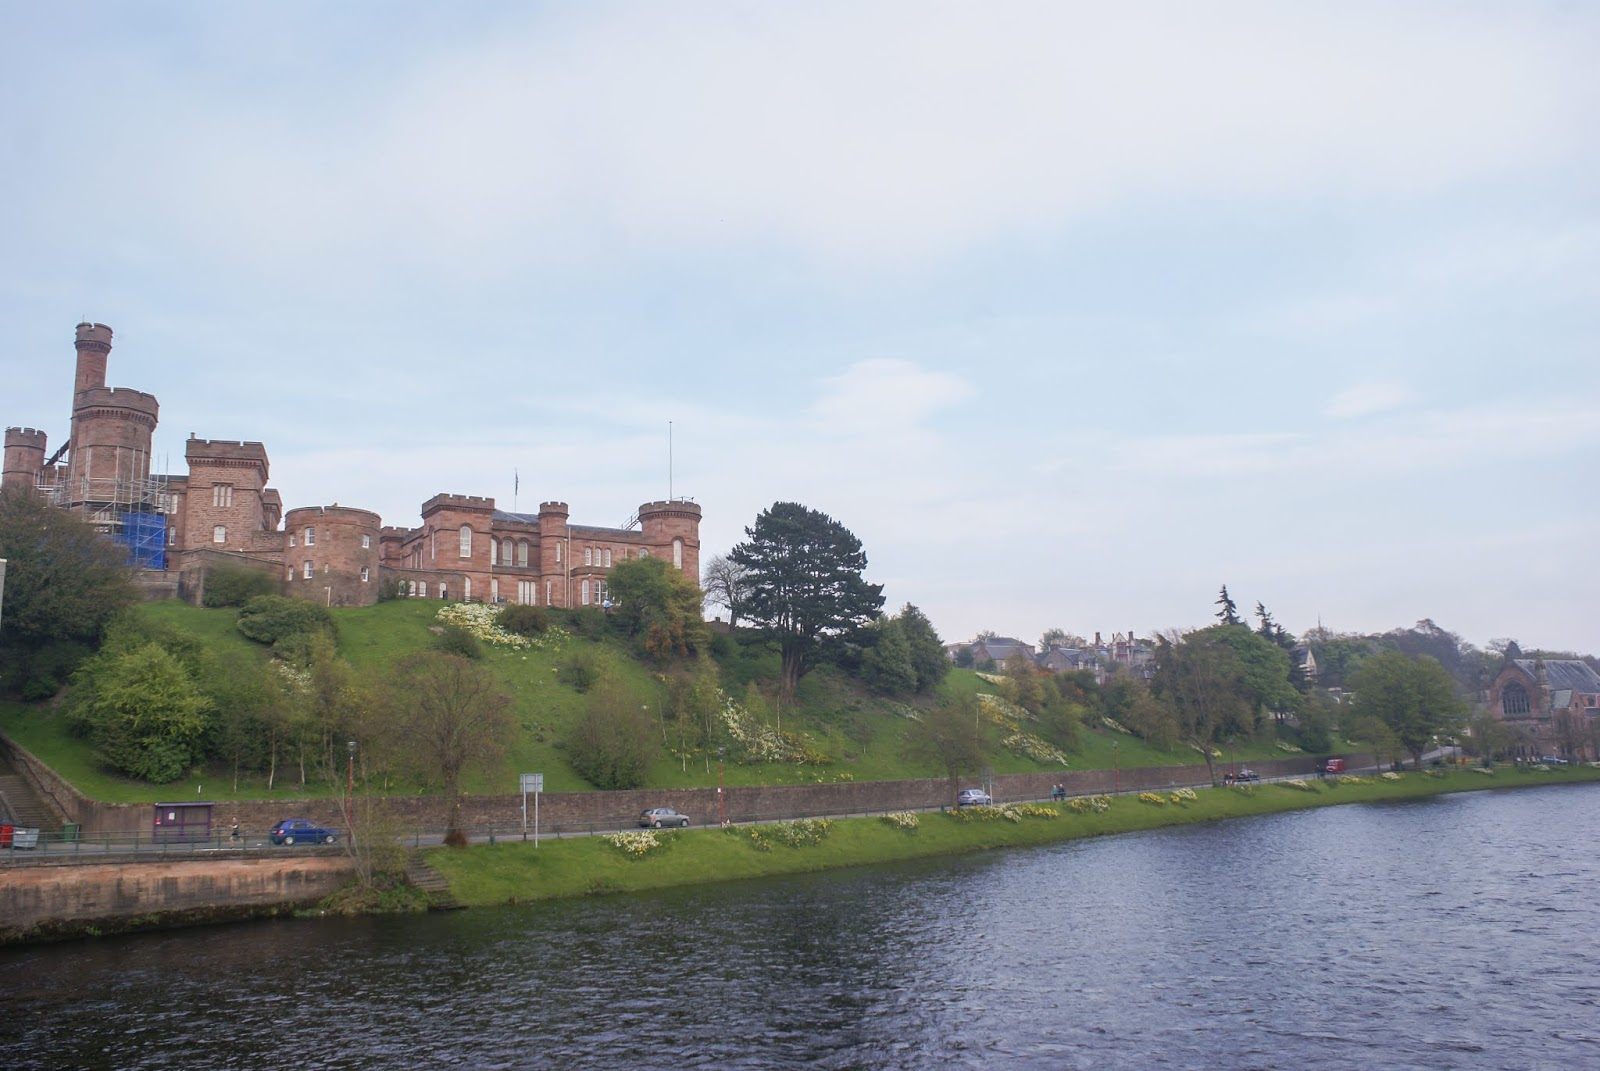 inverness castle scotland ness river